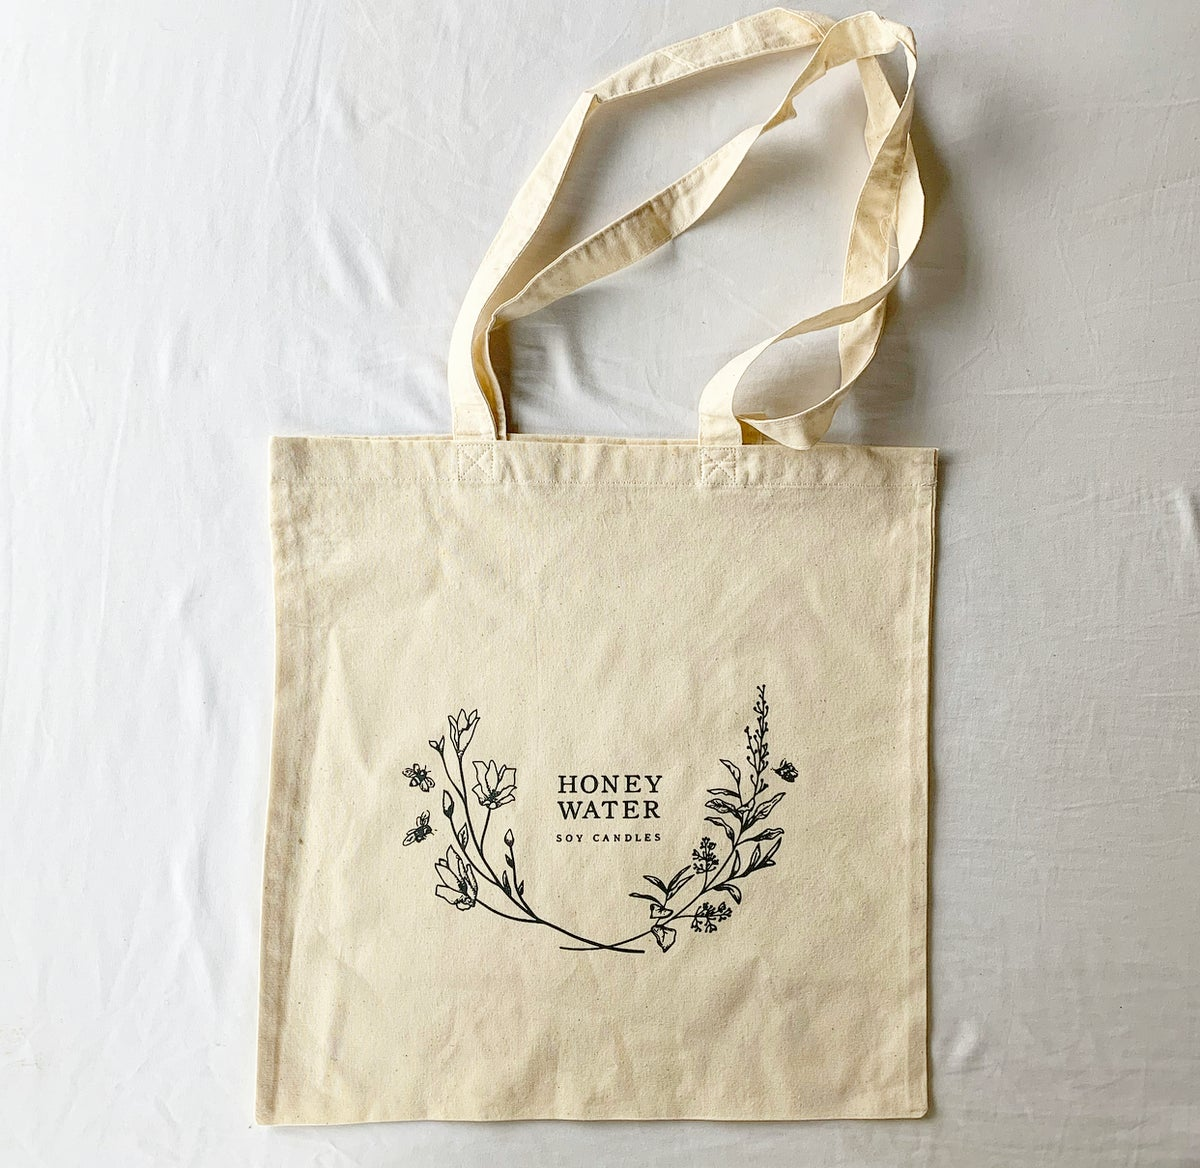 Image of cotton market tote